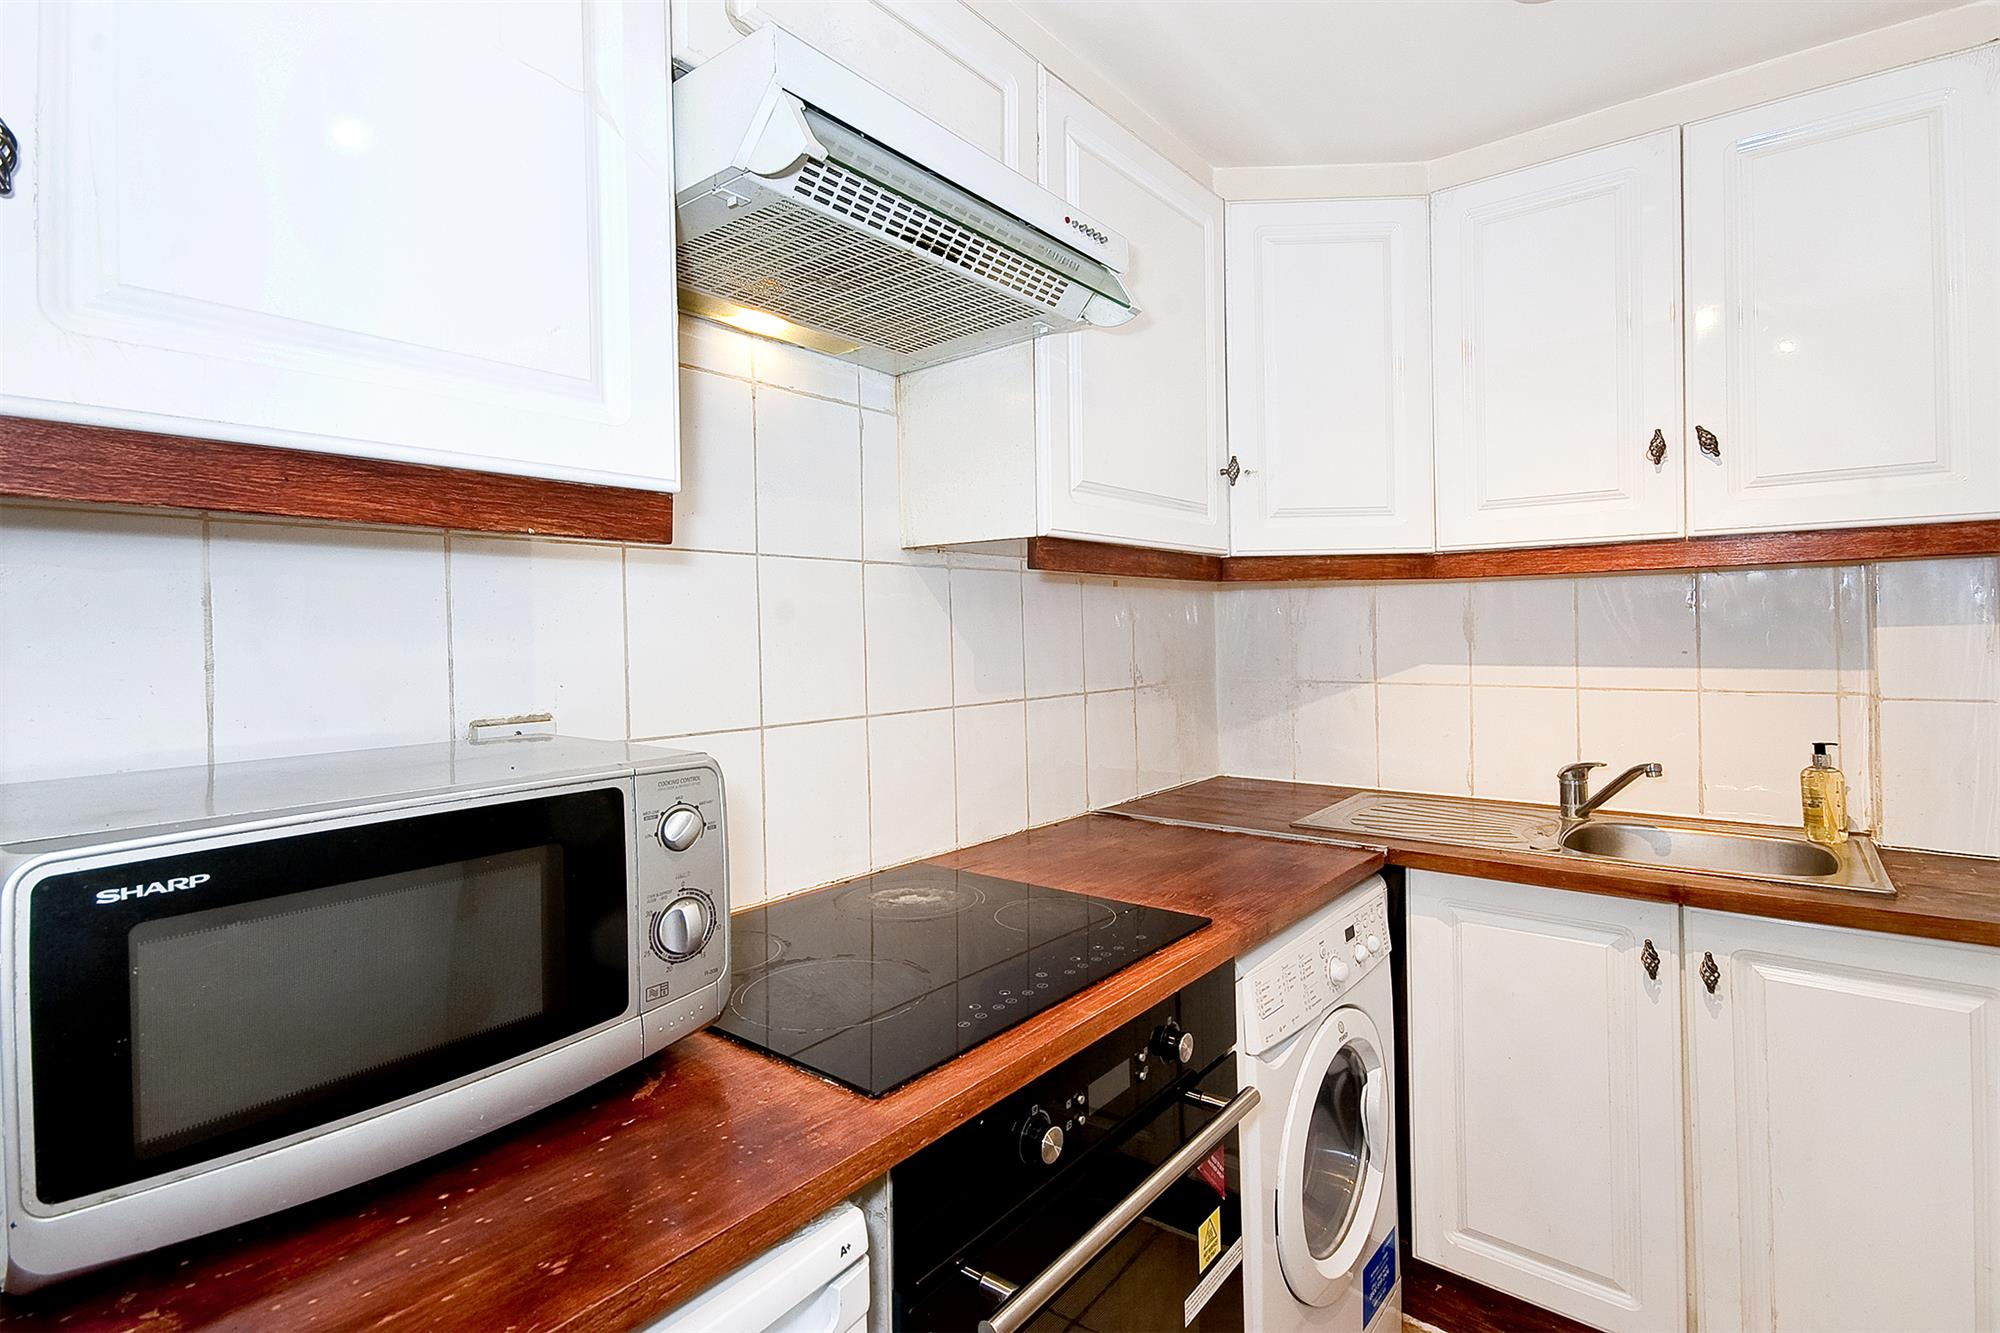 properties for sale 1 bedroom apartment park west edgware. Black Bedroom Furniture Sets. Home Design Ideas